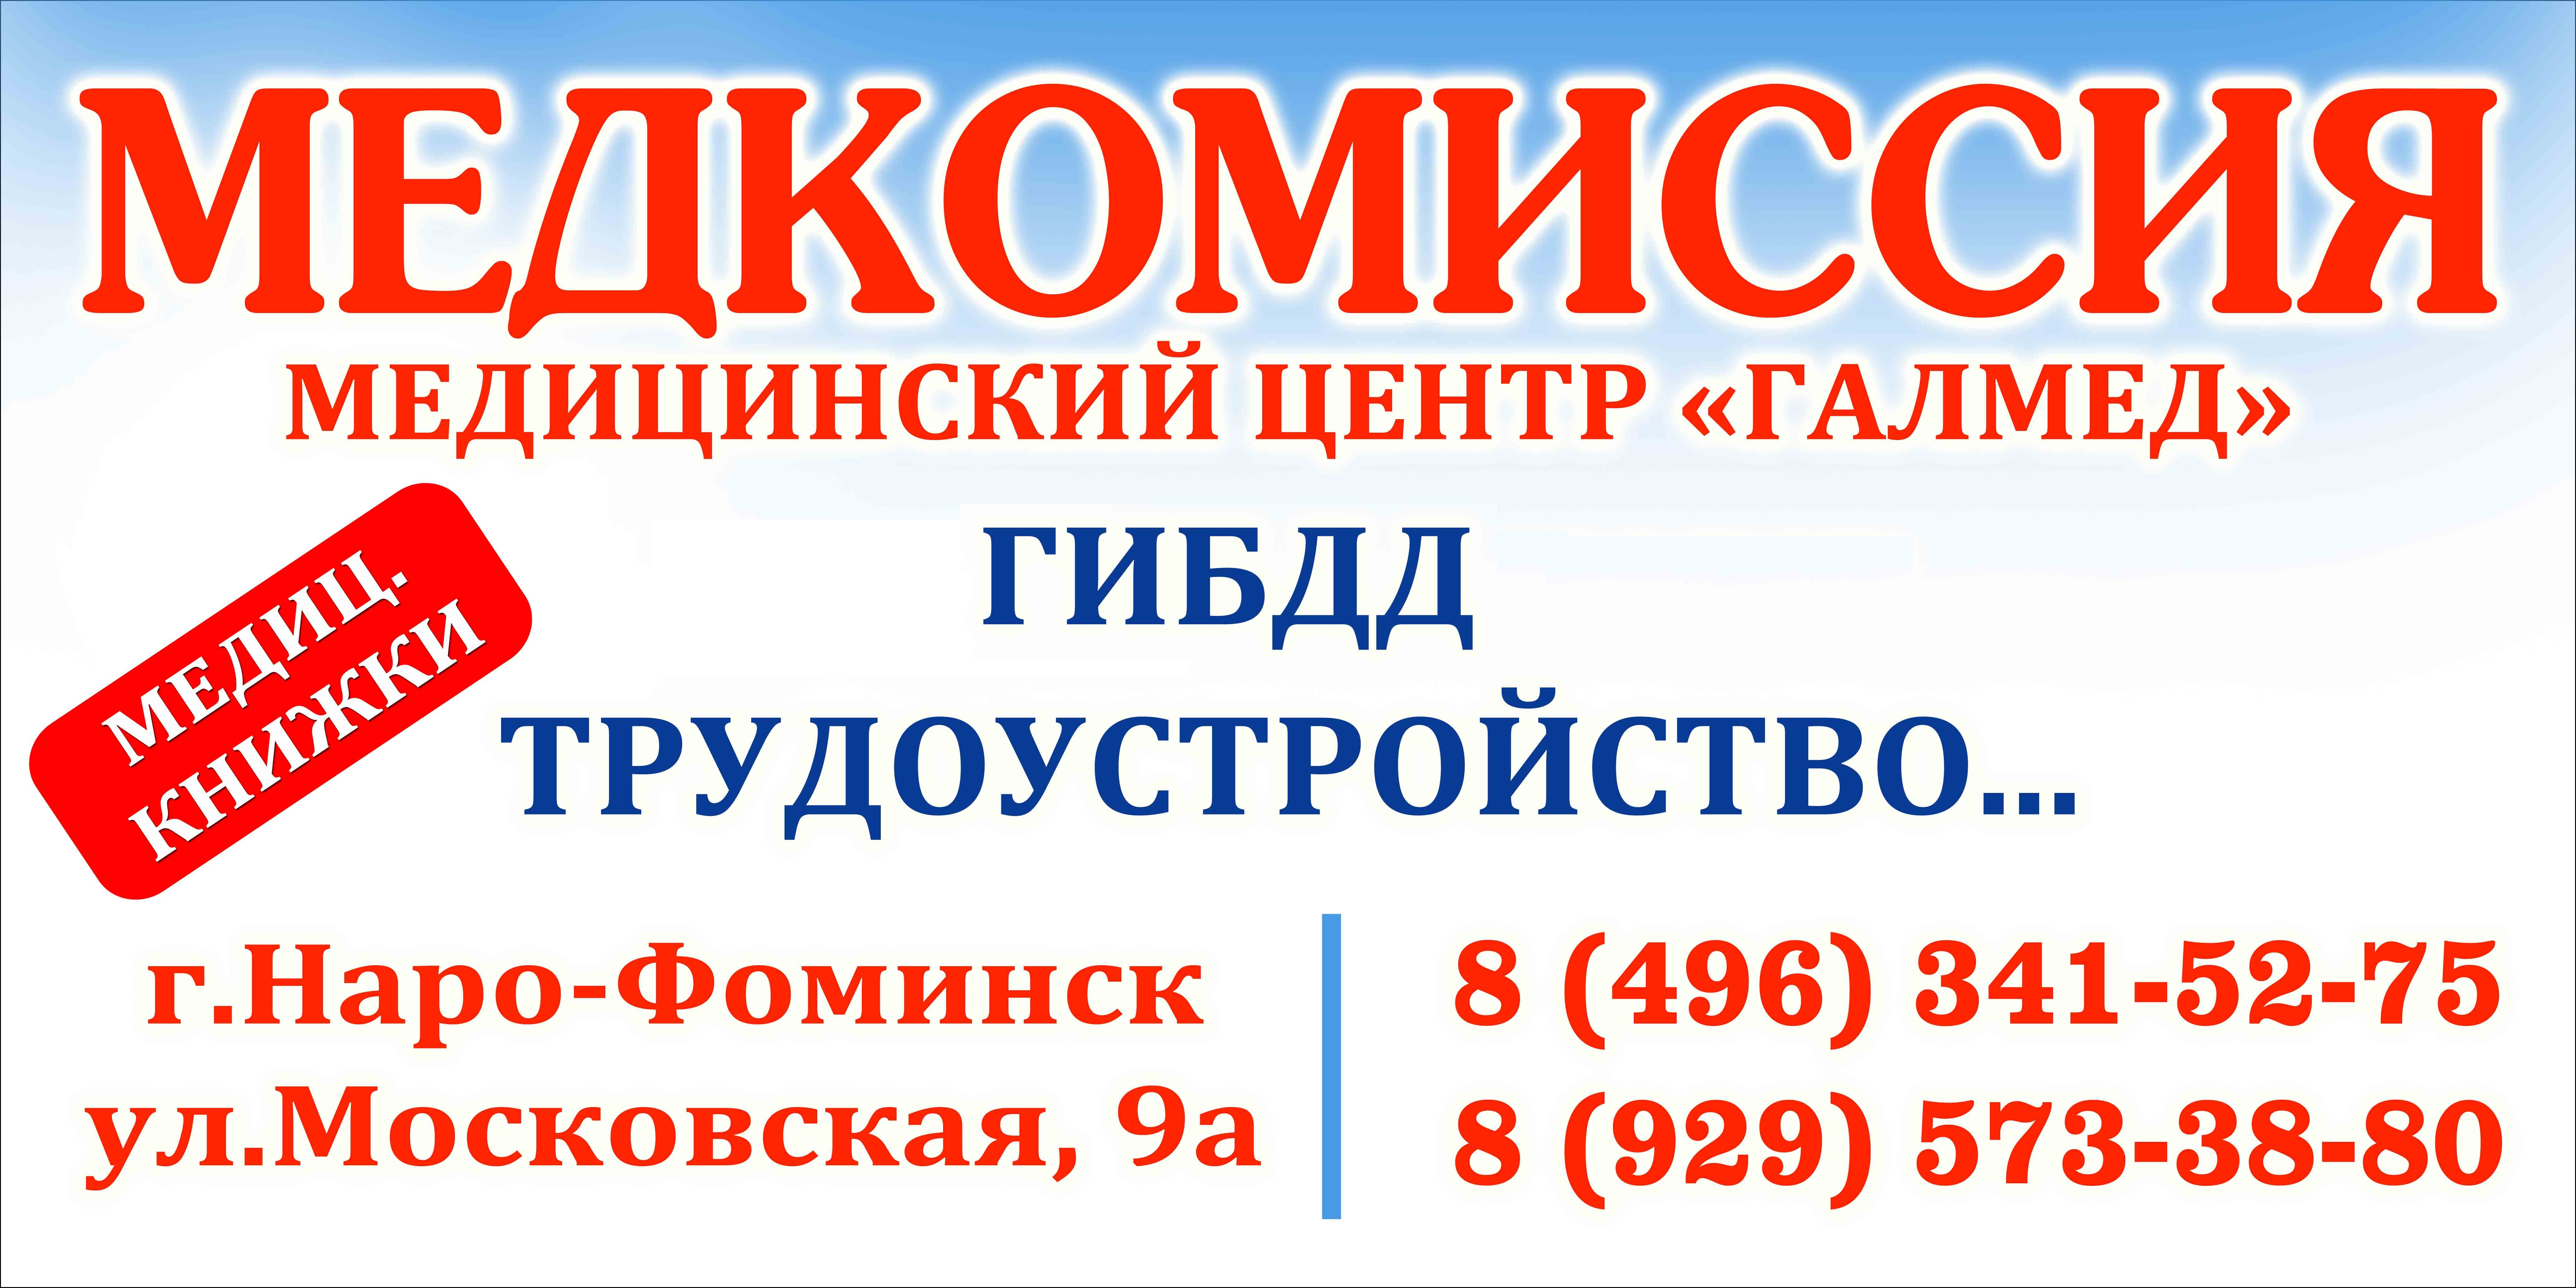 Медицинская книжка за 1 день цена Наро Фоминск юао